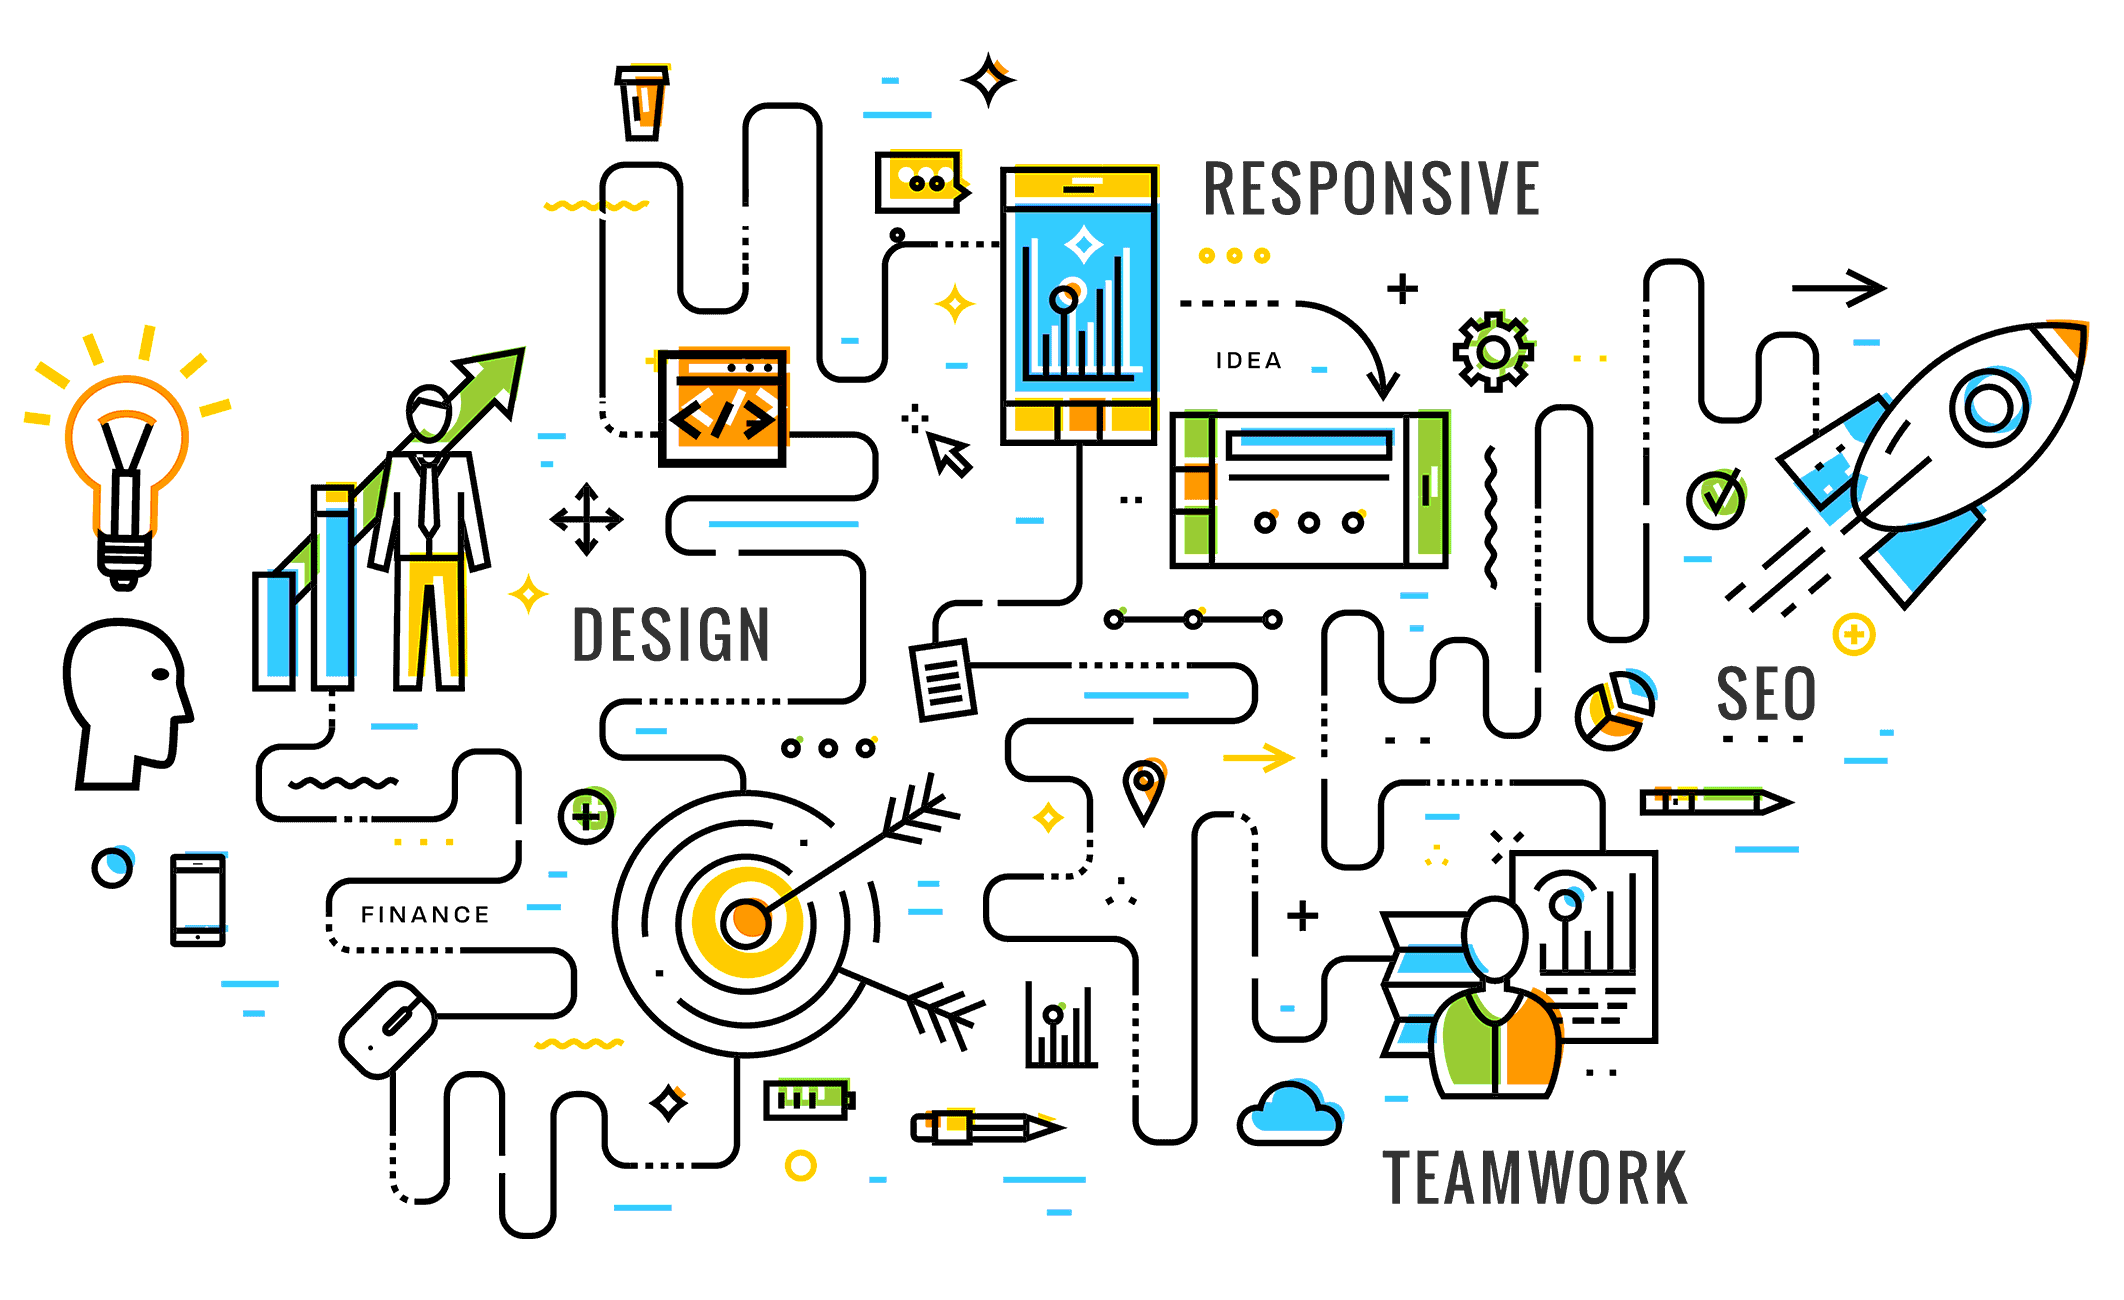 web-design-development-process-illustration